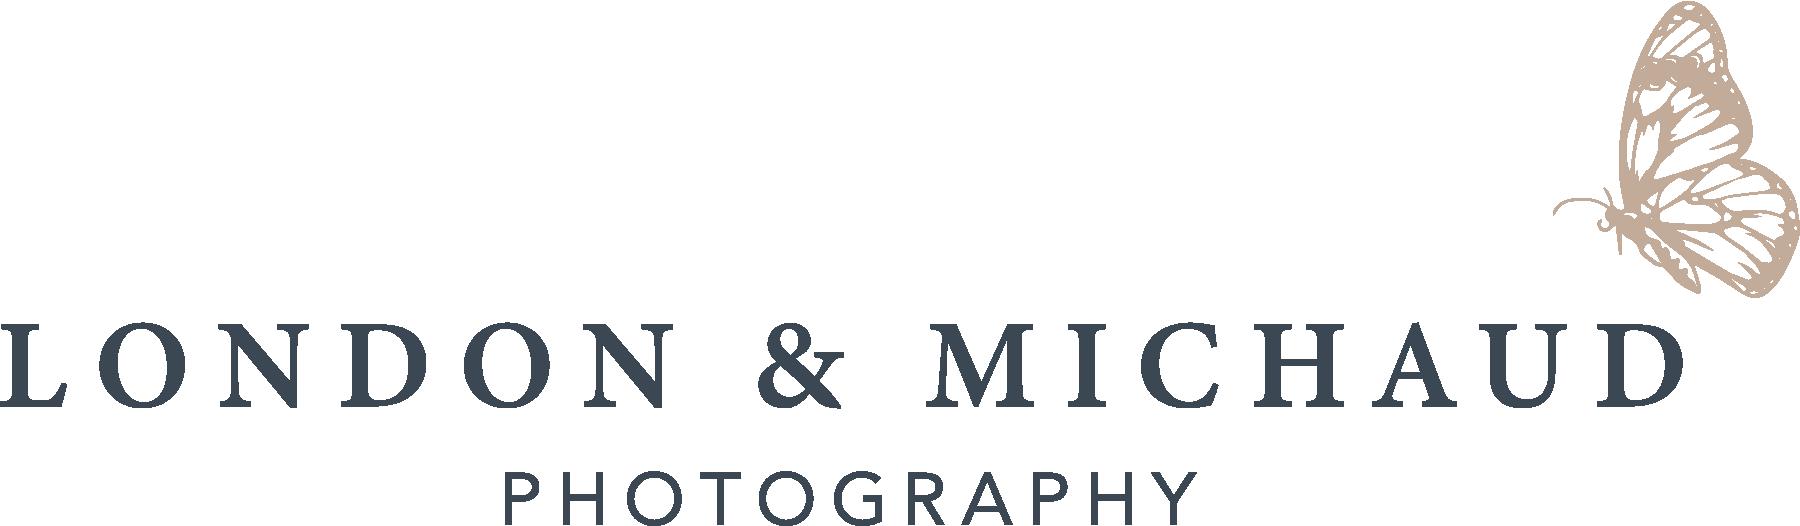 London & Michaud Photography LLC